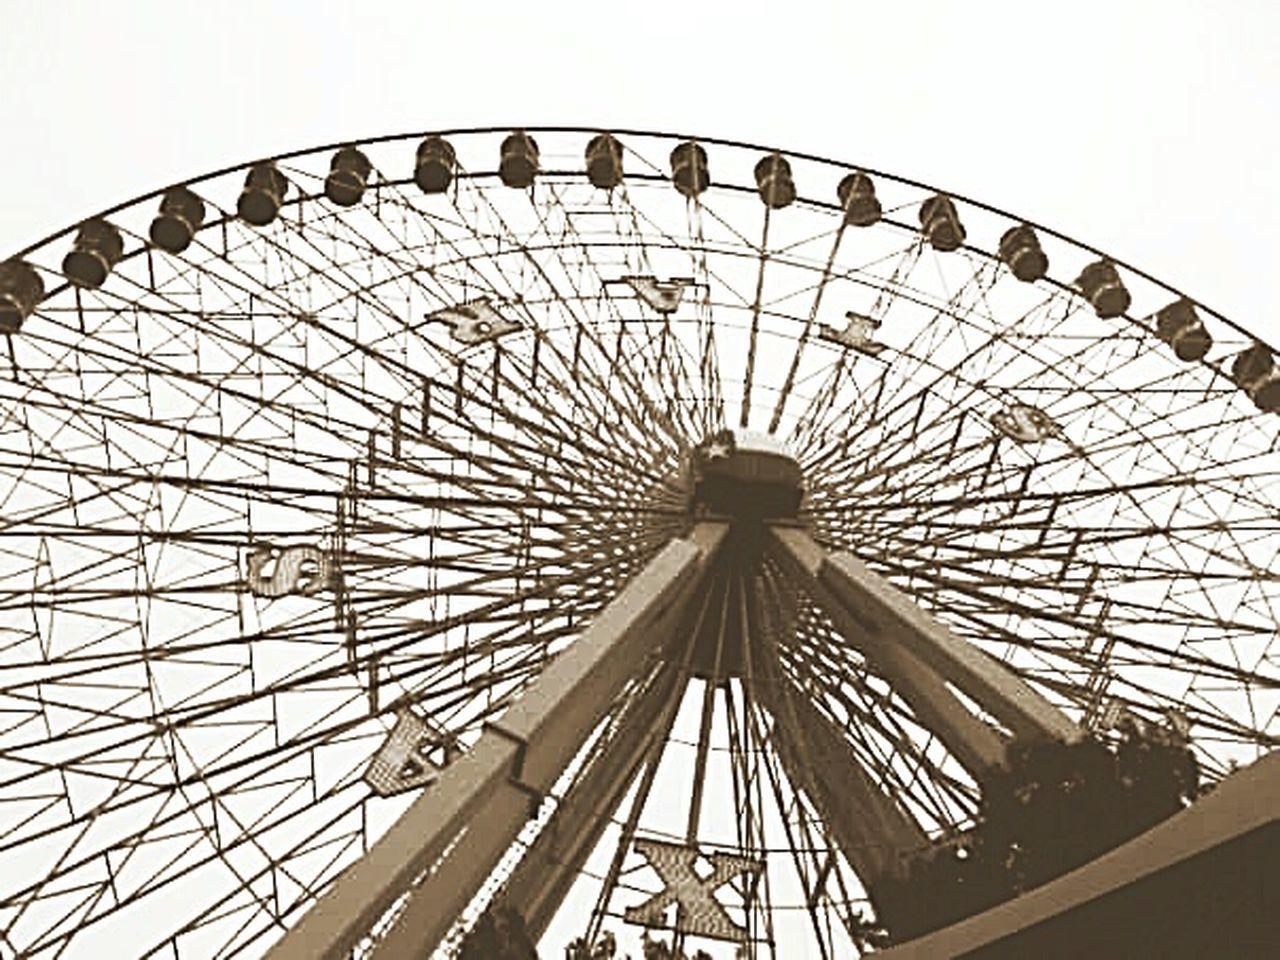 amusement park, ferris wheel, arts culture and entertainment, amusement park ride, no people, traveling carnival, day, outdoors, sky